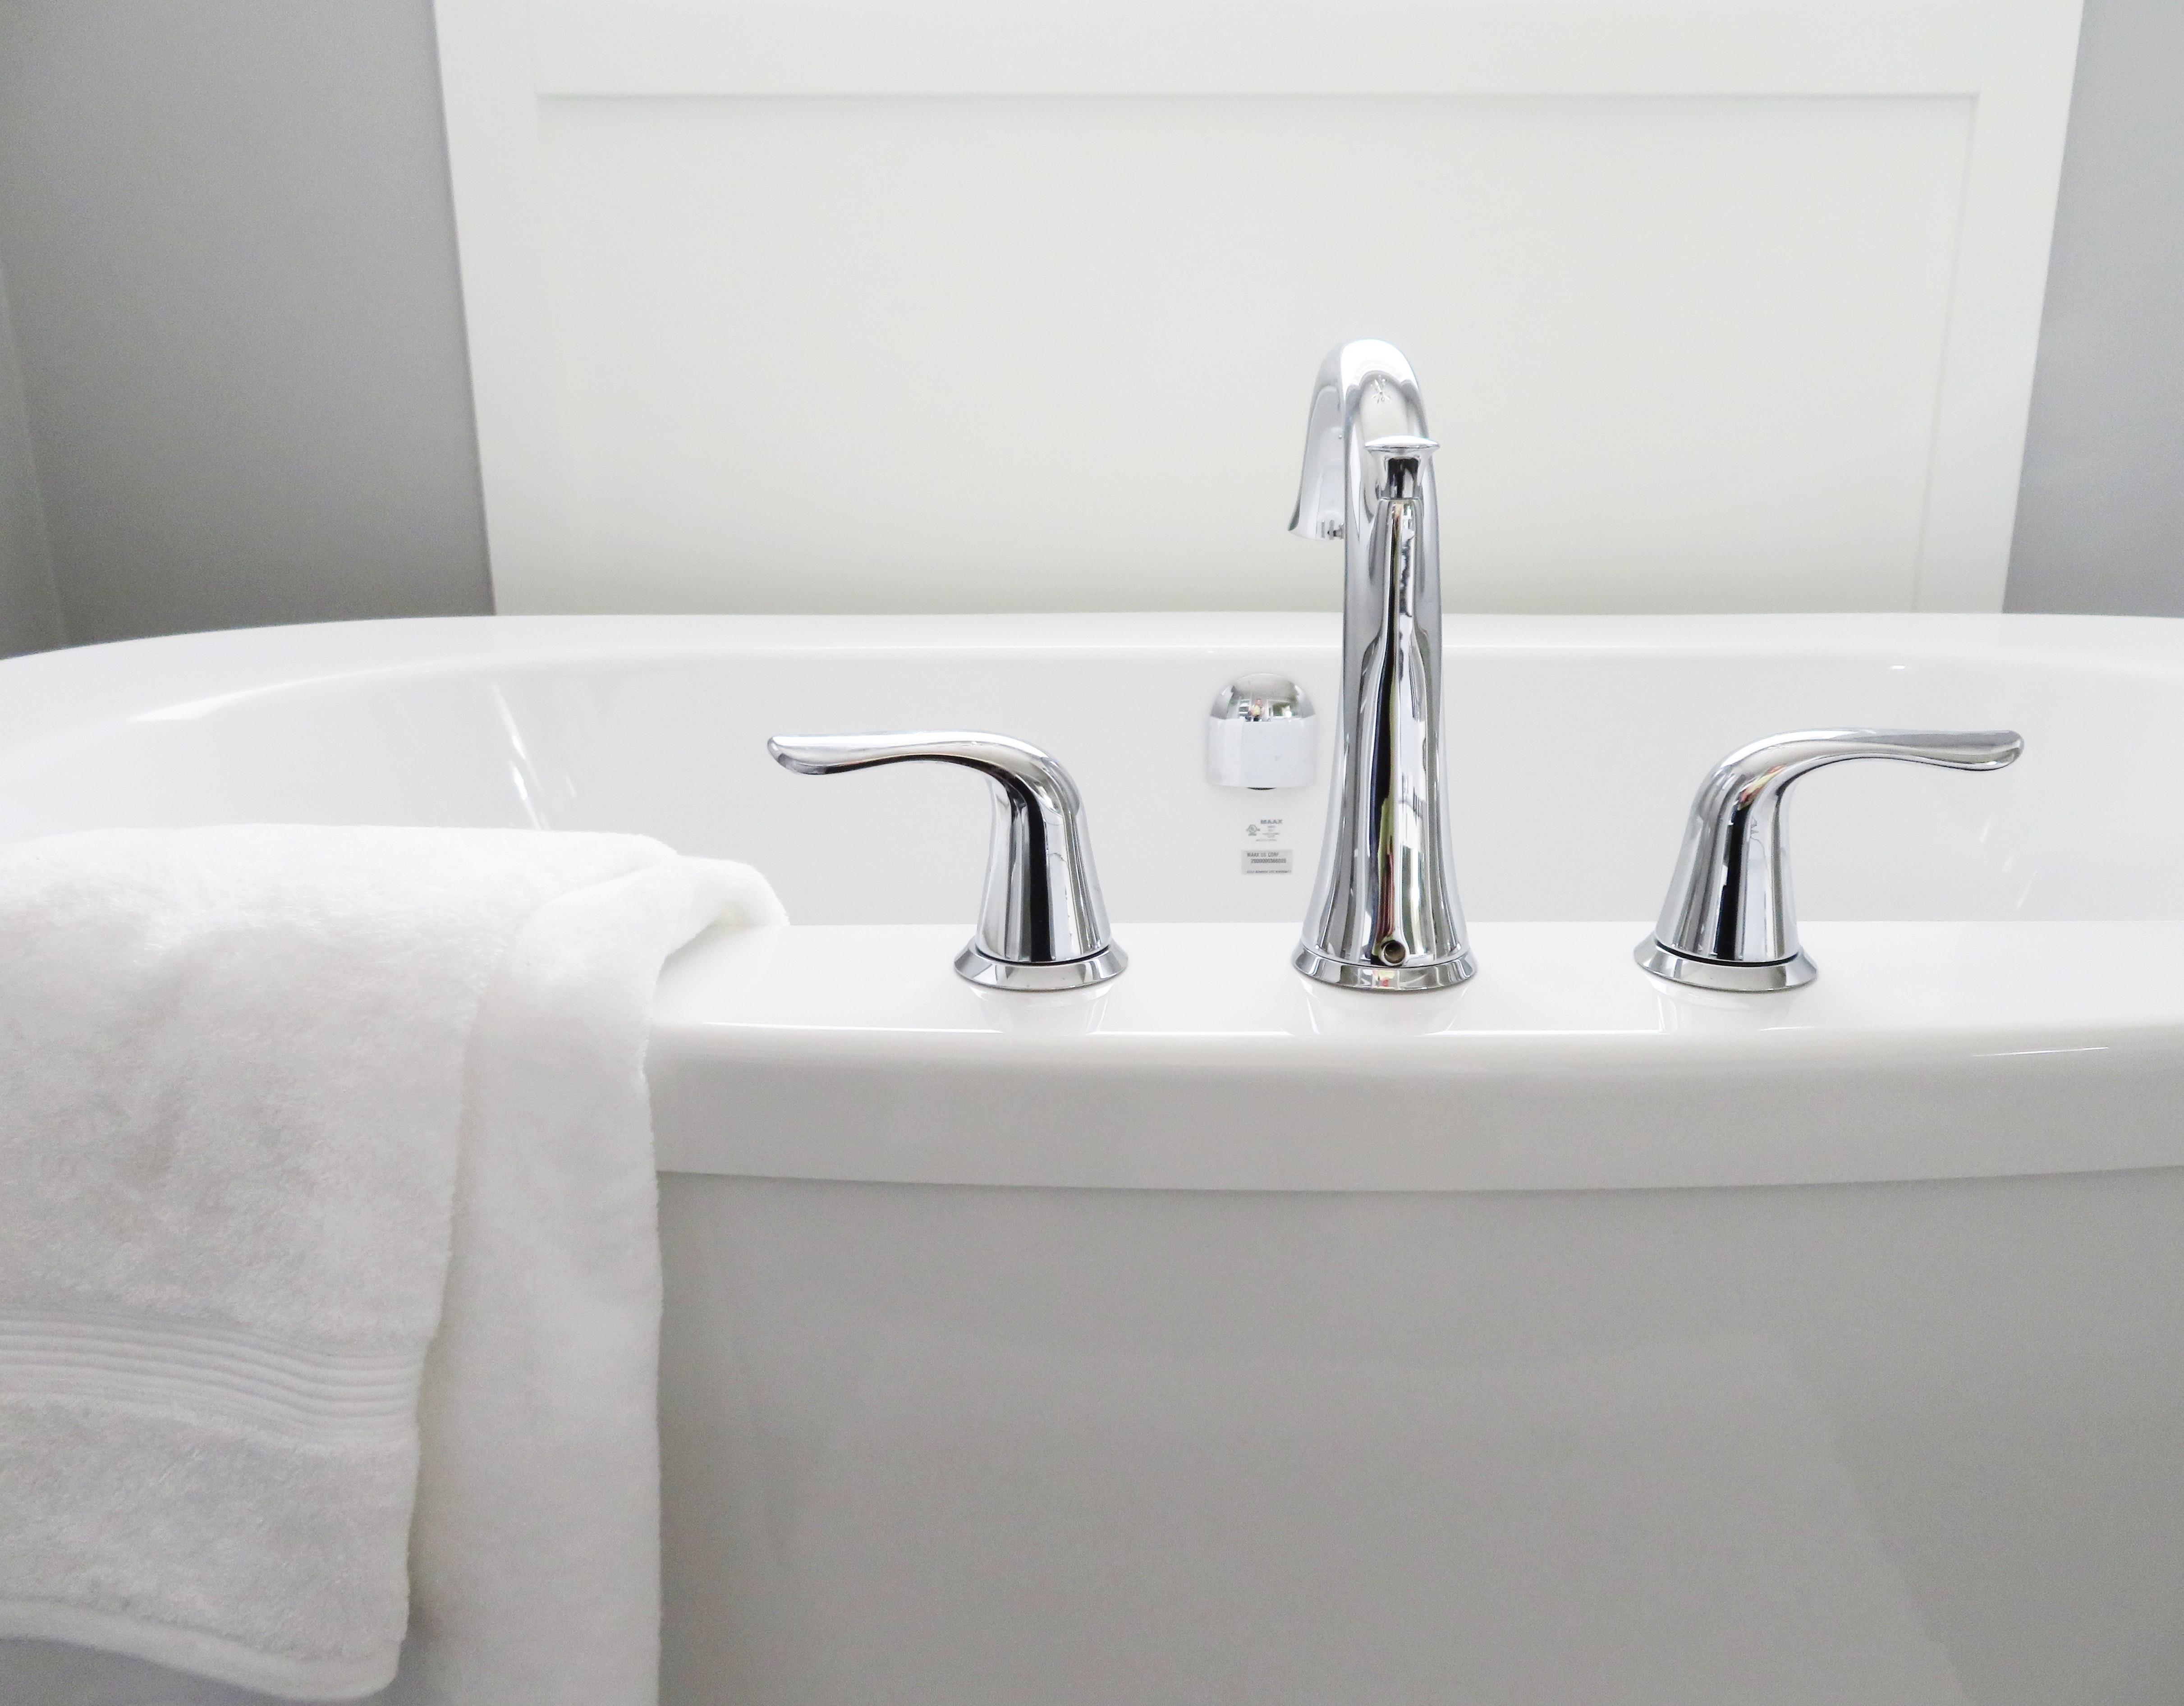 Captivating Edit With Snappa · Bath, Bathroom ...